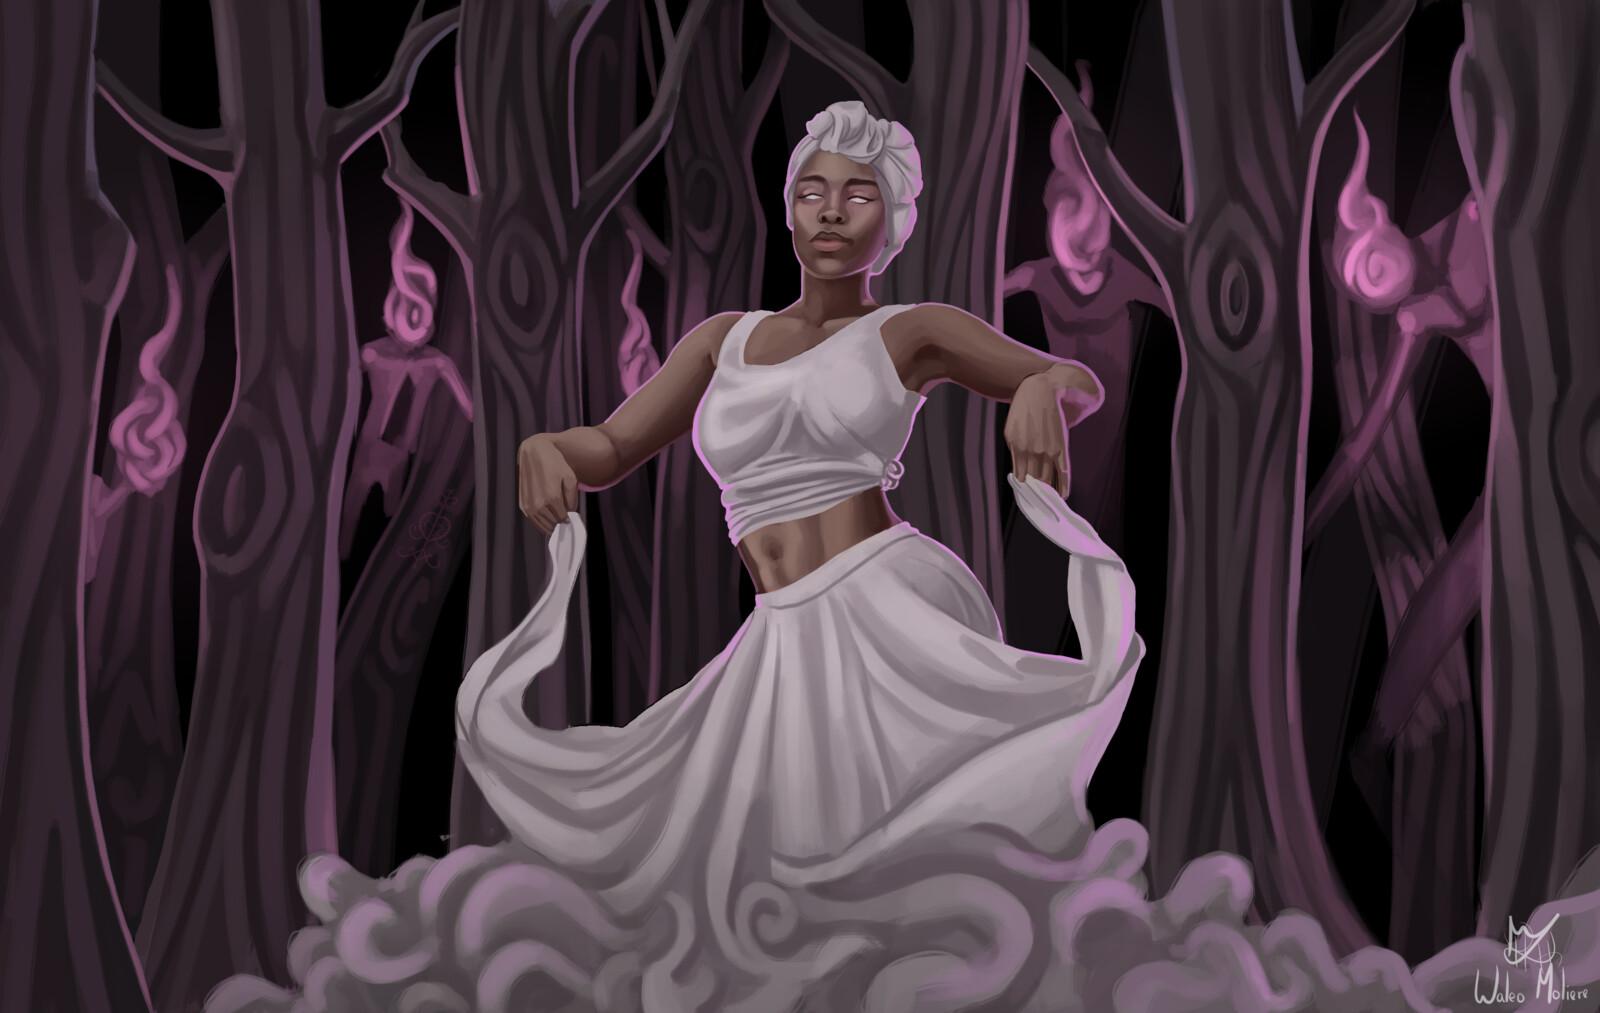 Manbo- Voodoo priestess